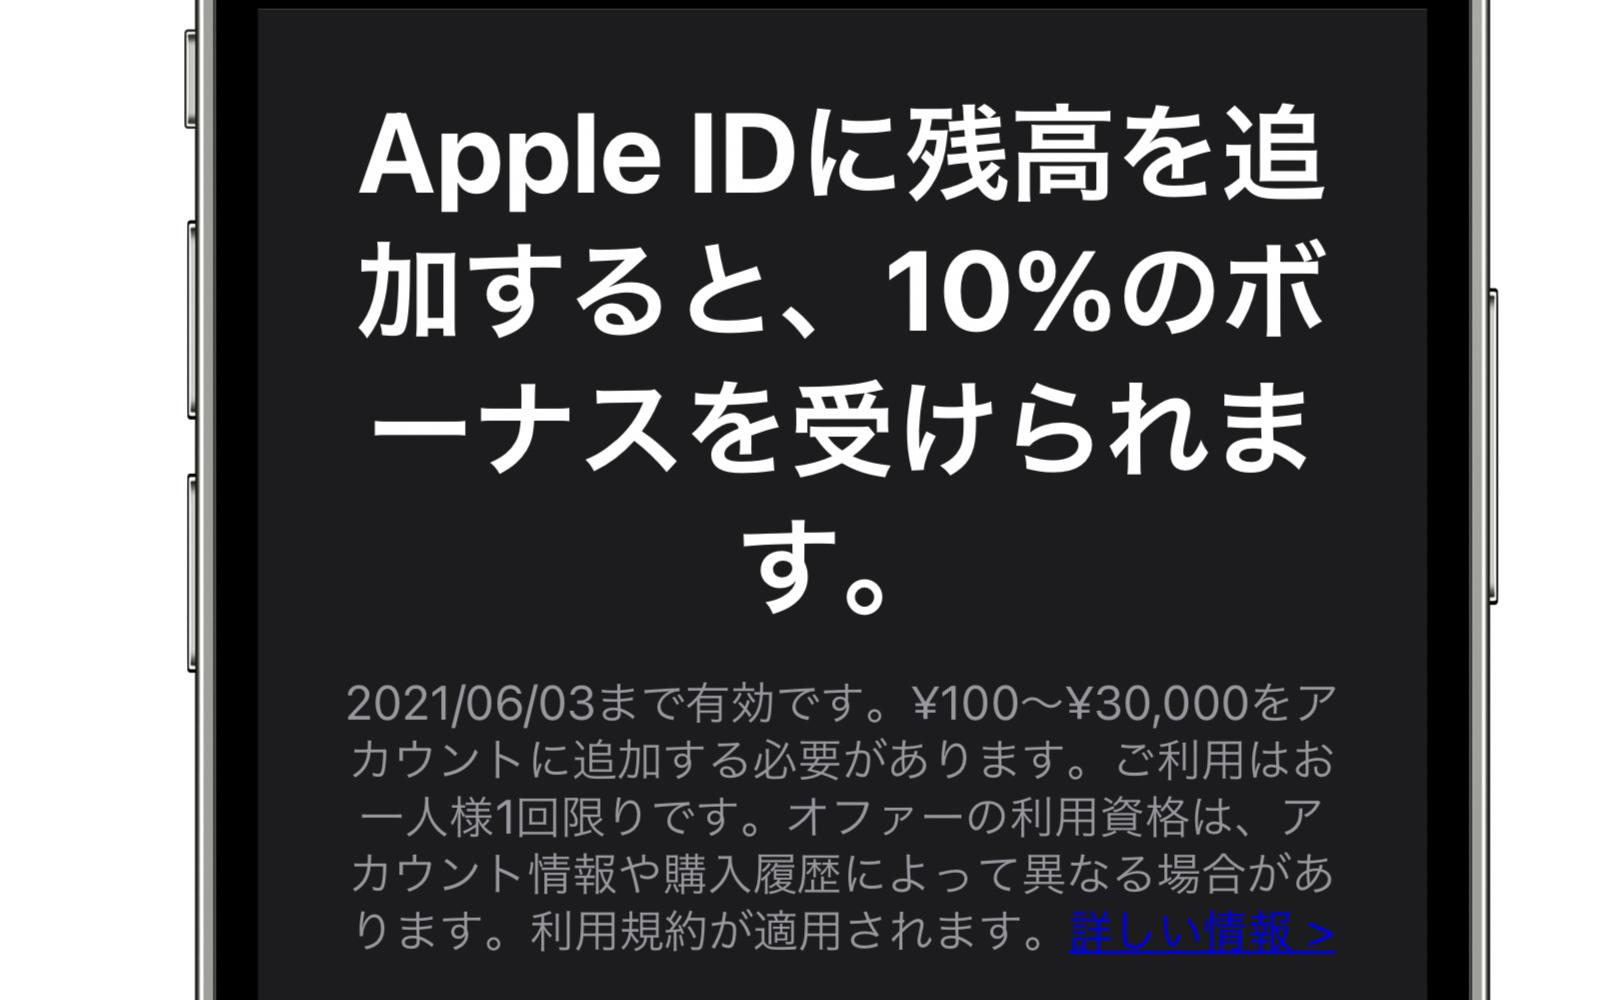 Apple ID 10Percent cashback